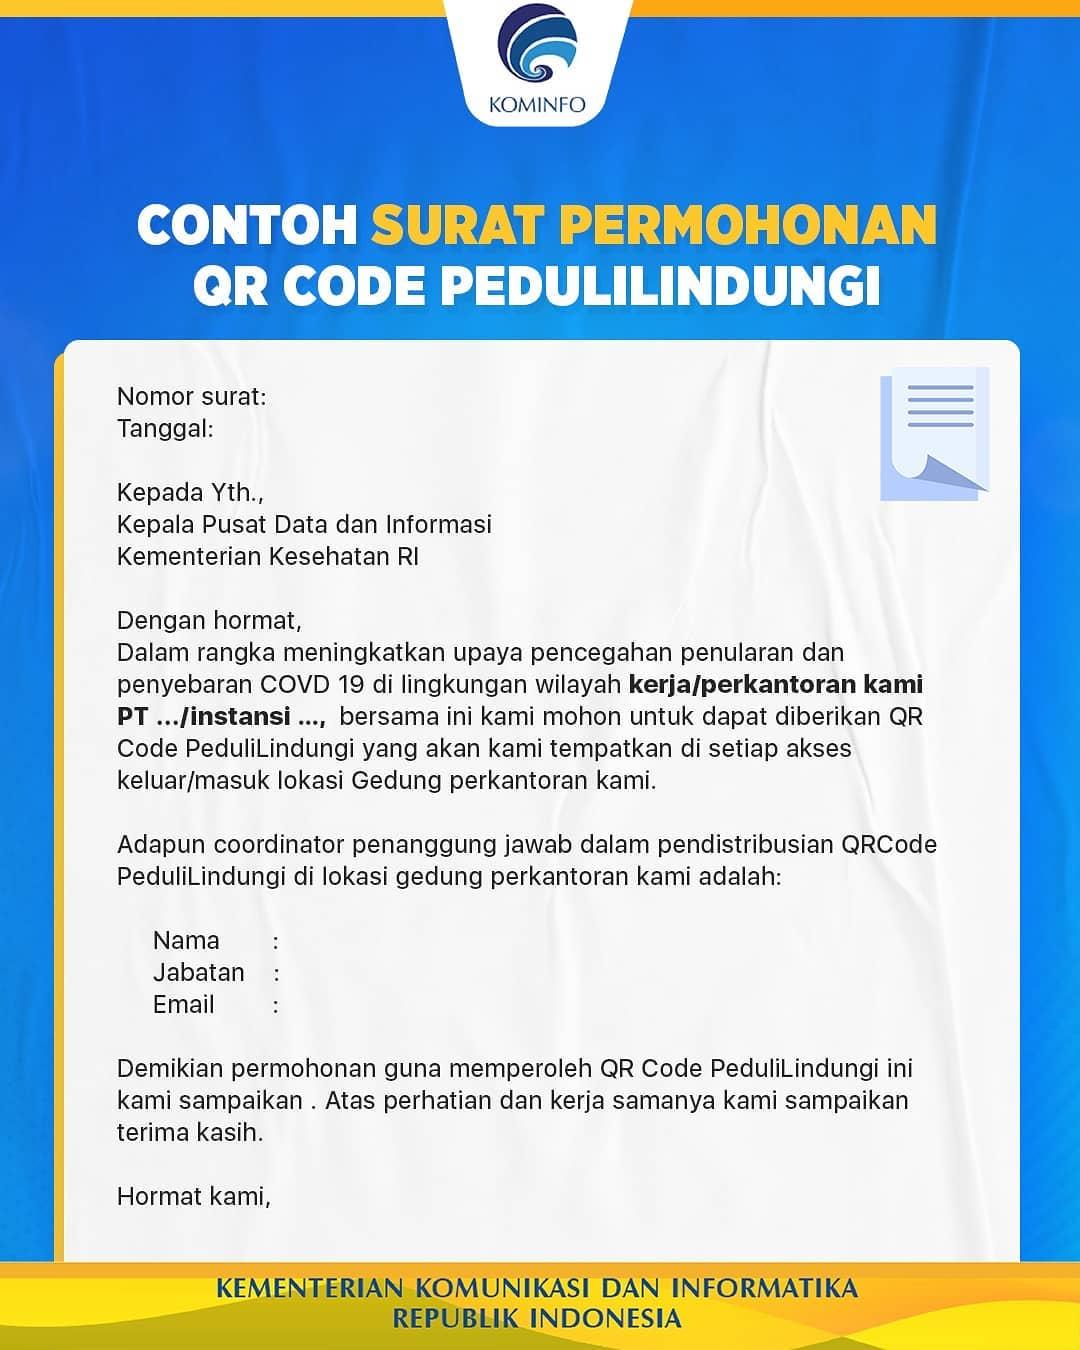 Contoh Surat Permohonan QR Code Check In Pedulilindungi